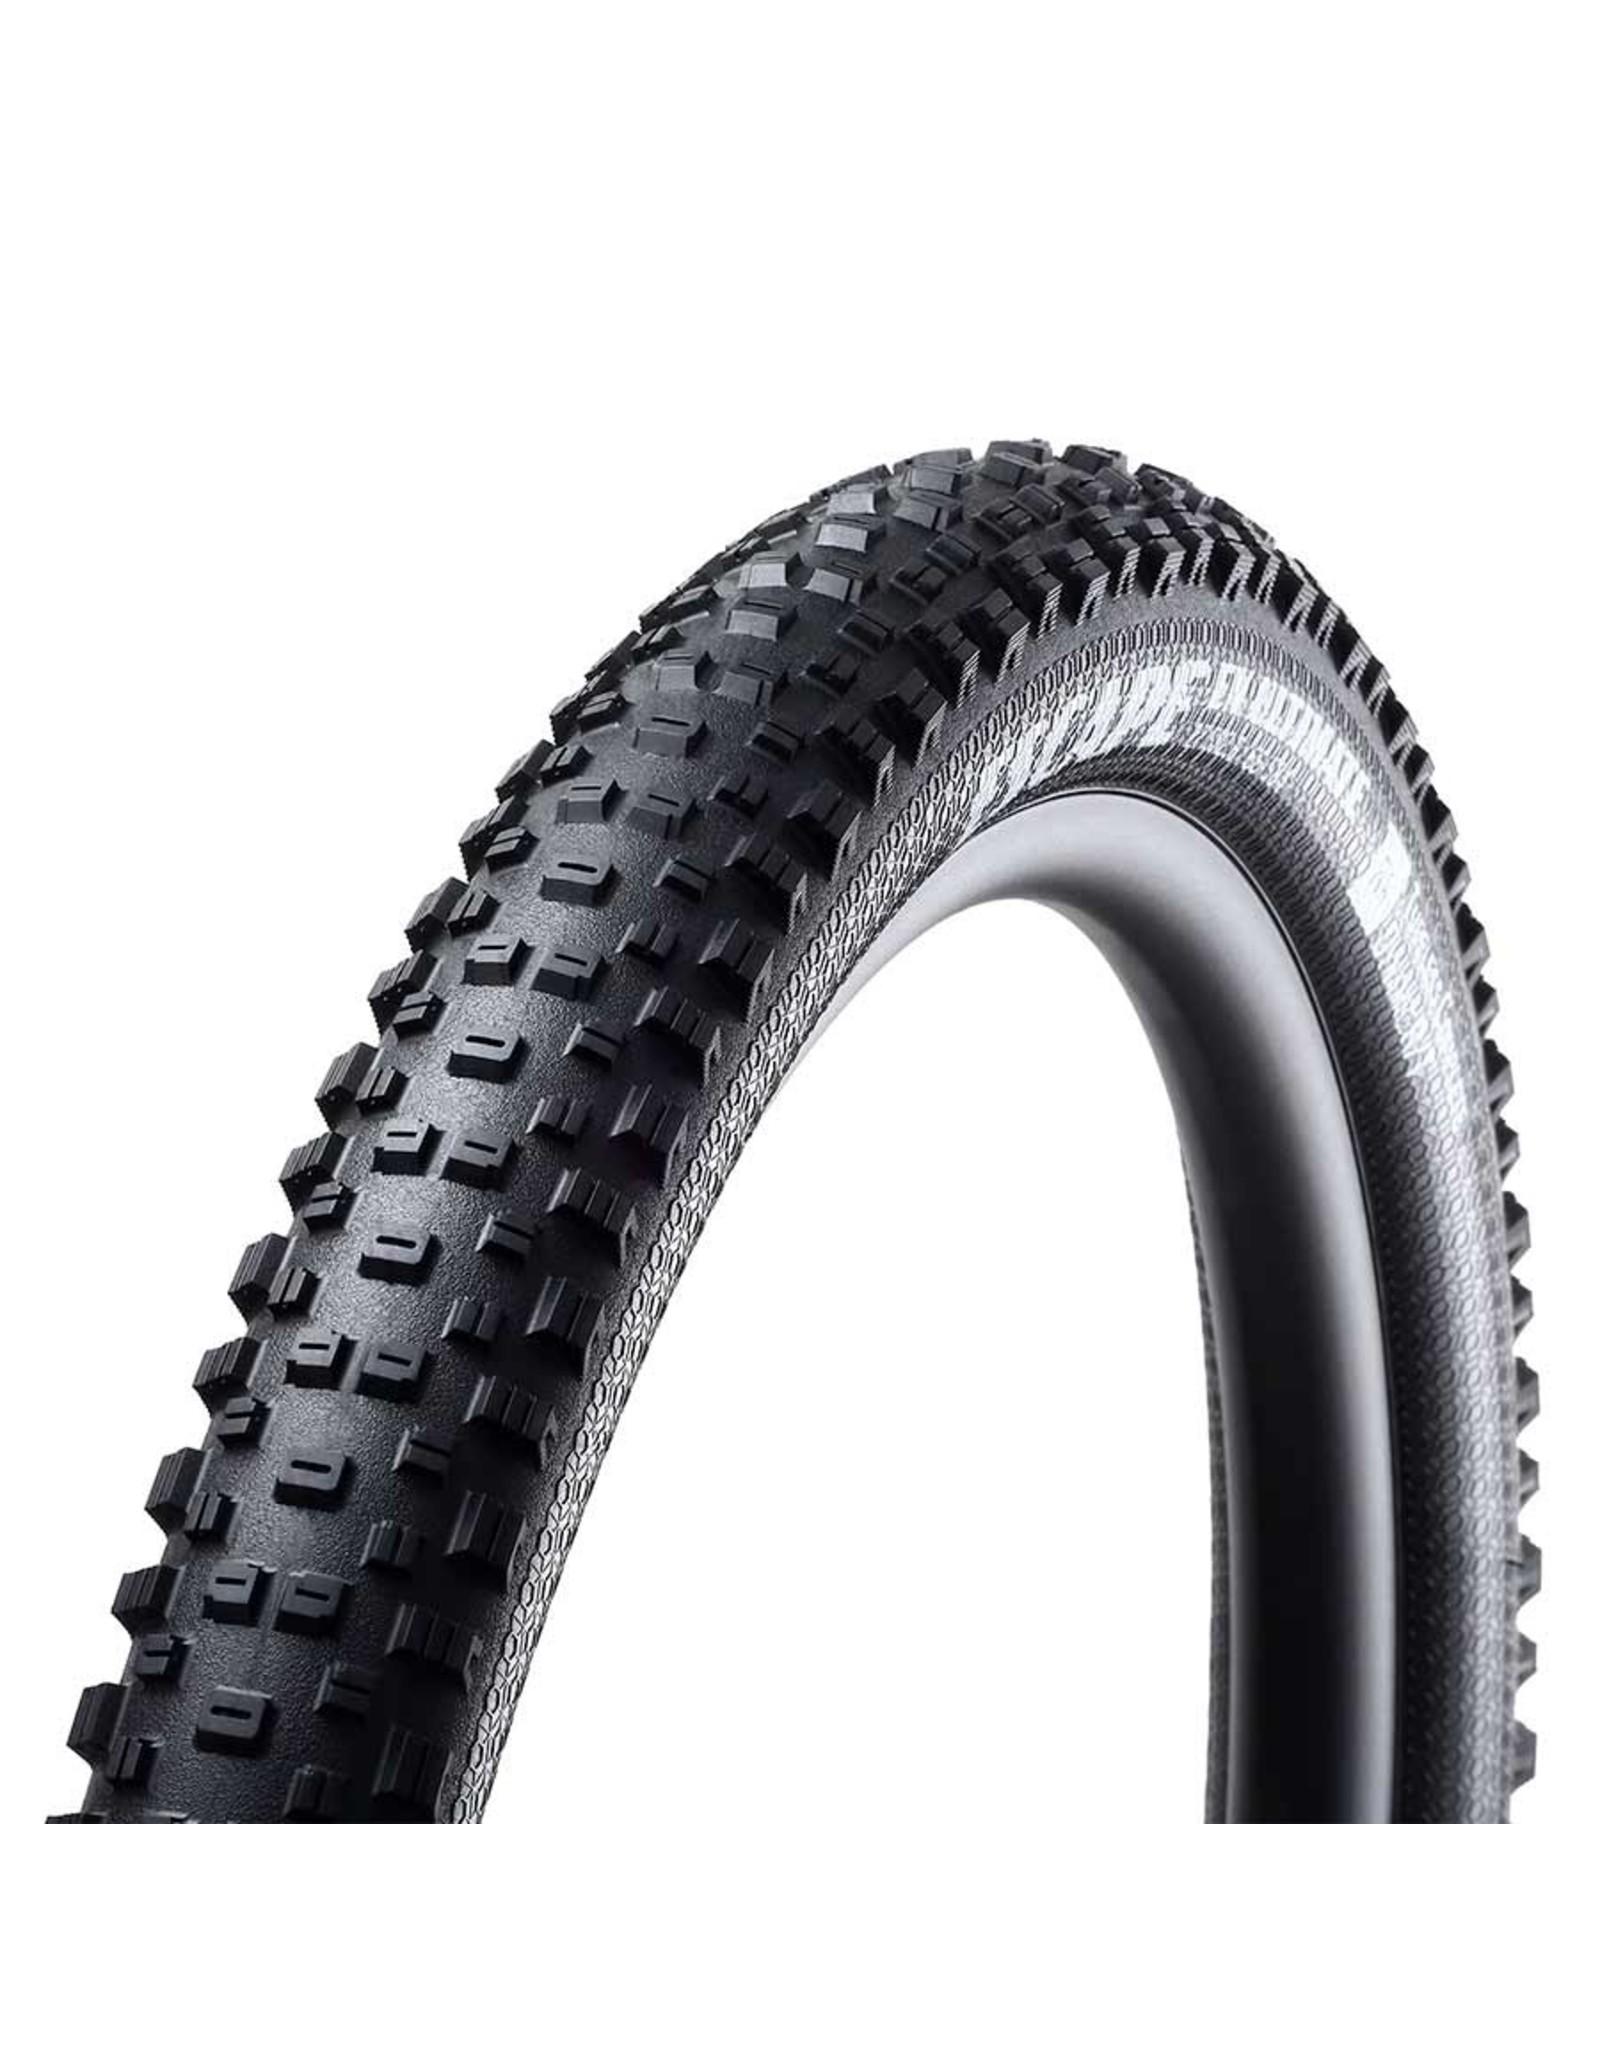 Goodyear Goodyear, Escape, Tire, 27.5''x2.60, Folding, Tubeless Ready, Dynamic:R/T, EN Ultimate, 240TPI, Black